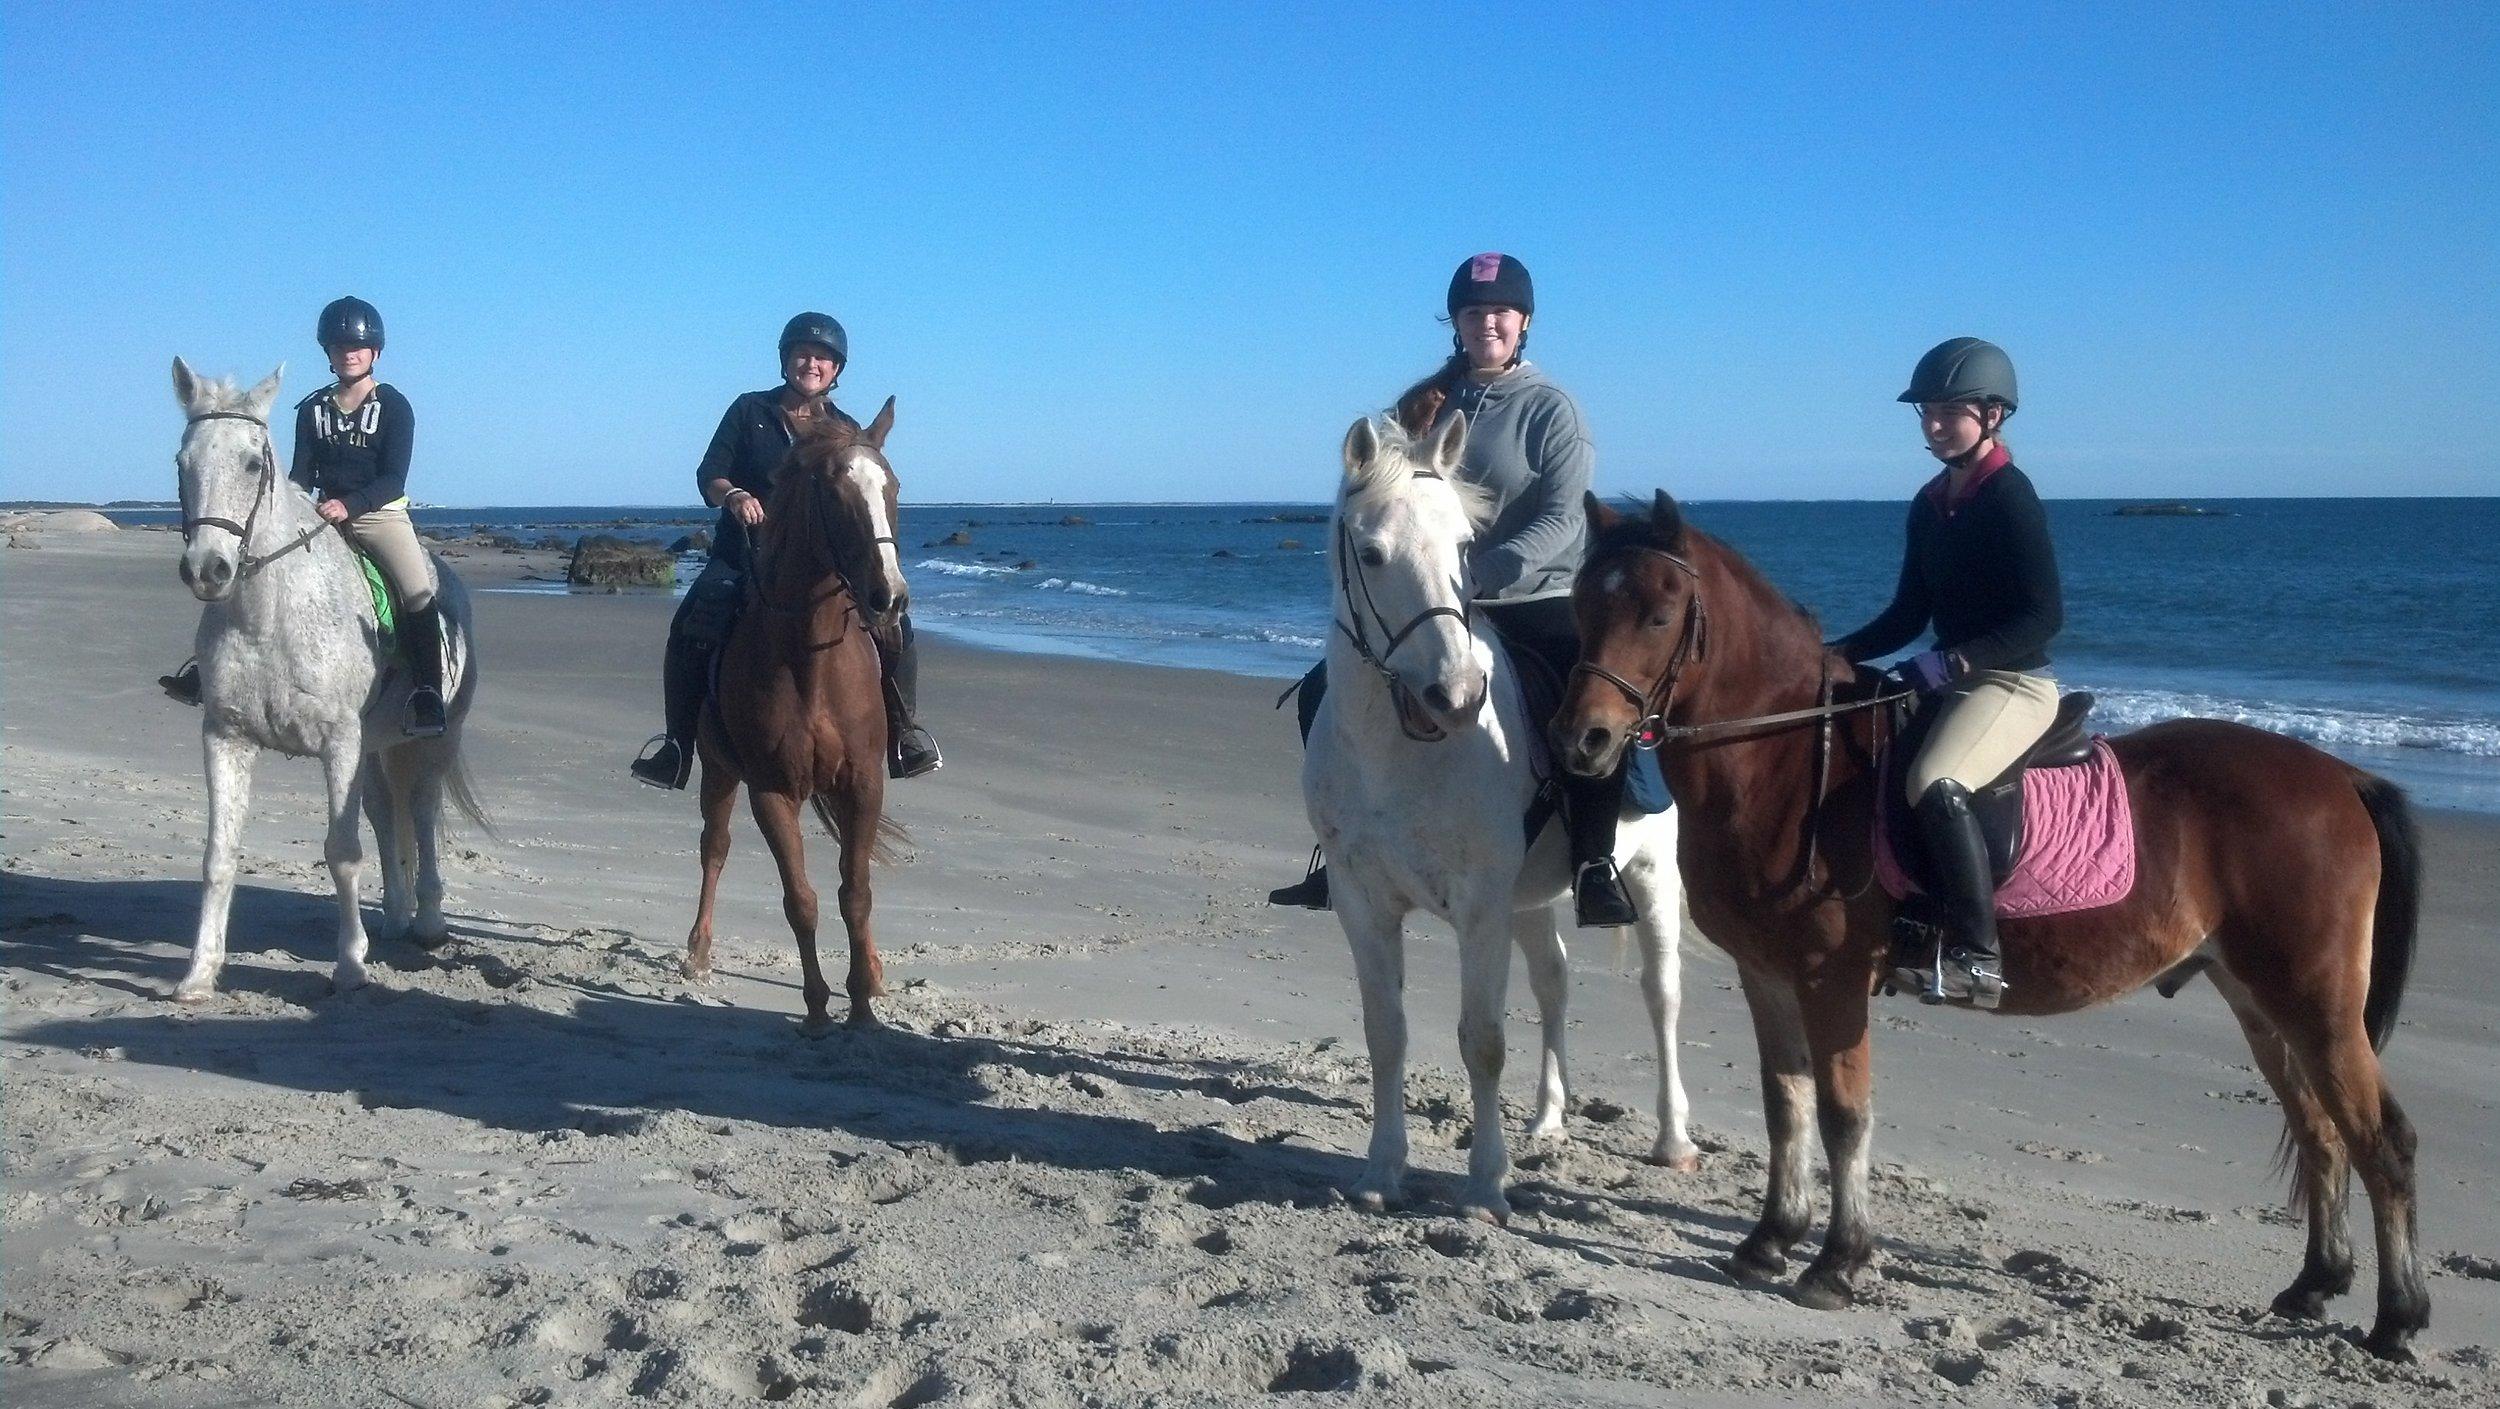 beach ride oct 2013 (13).jpg